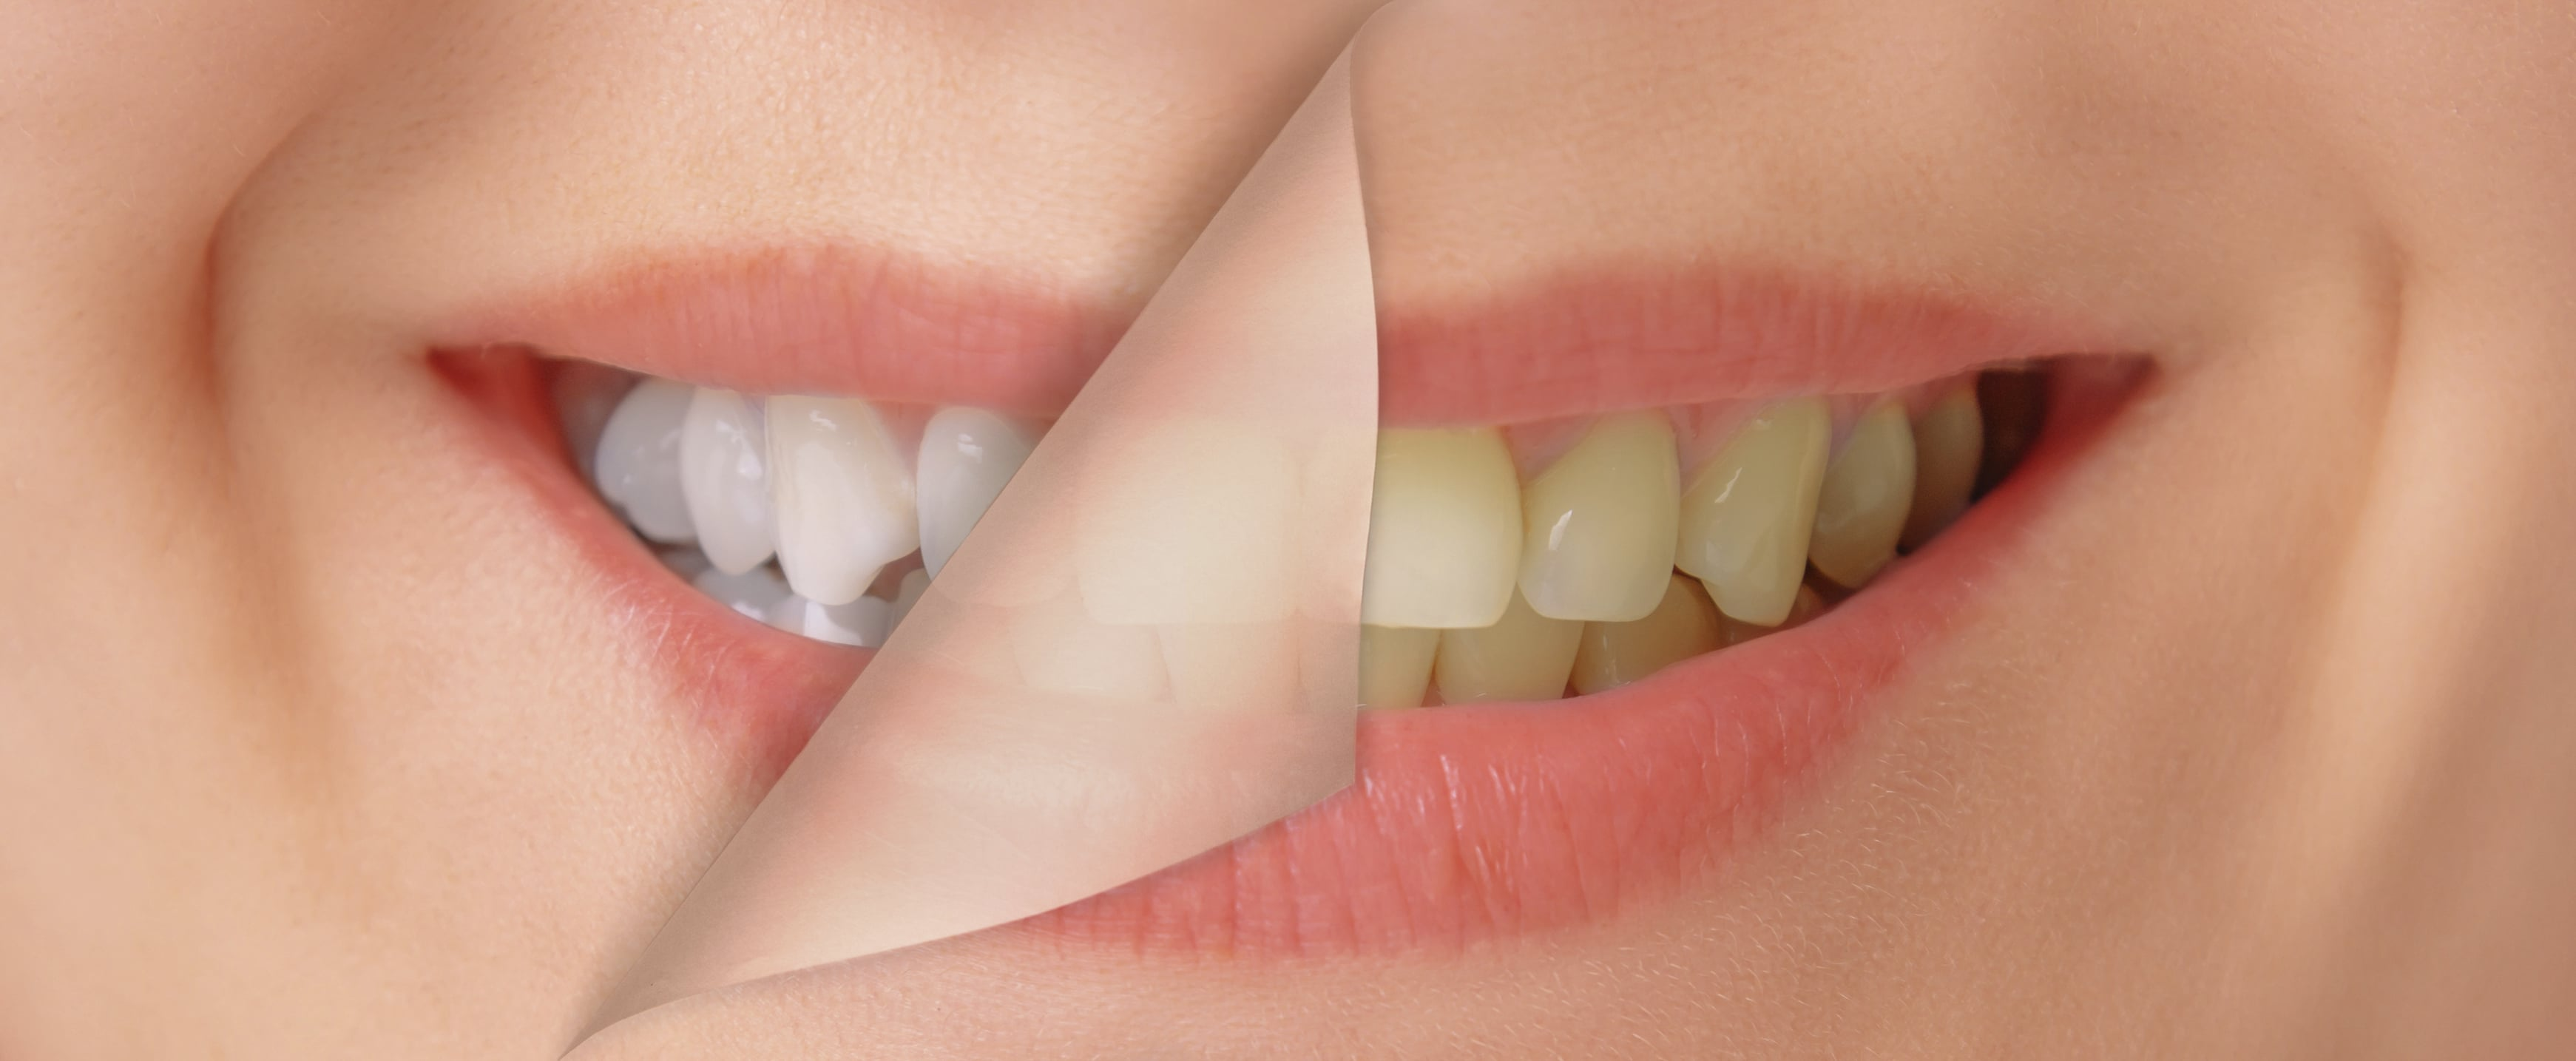 Blanqueamiento dental: Resolviendo dudas